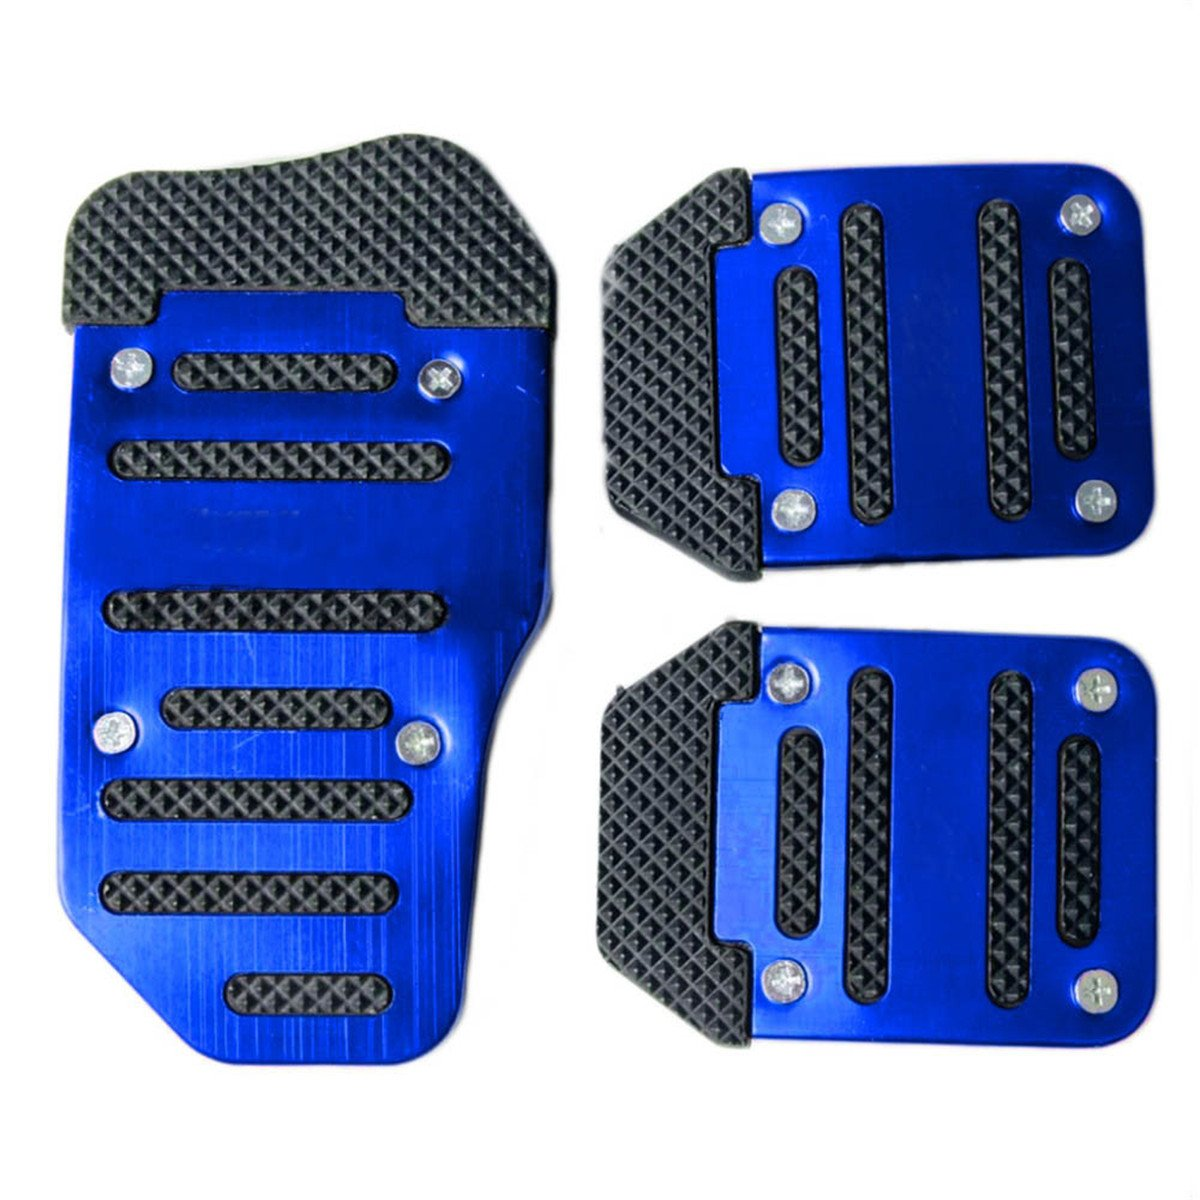 Fochutech 3 Pcs Nonslip Pedal Foot Brake Accelerator Cover Set for Car Auto Vehicle Automatic Aluminium (Blue)